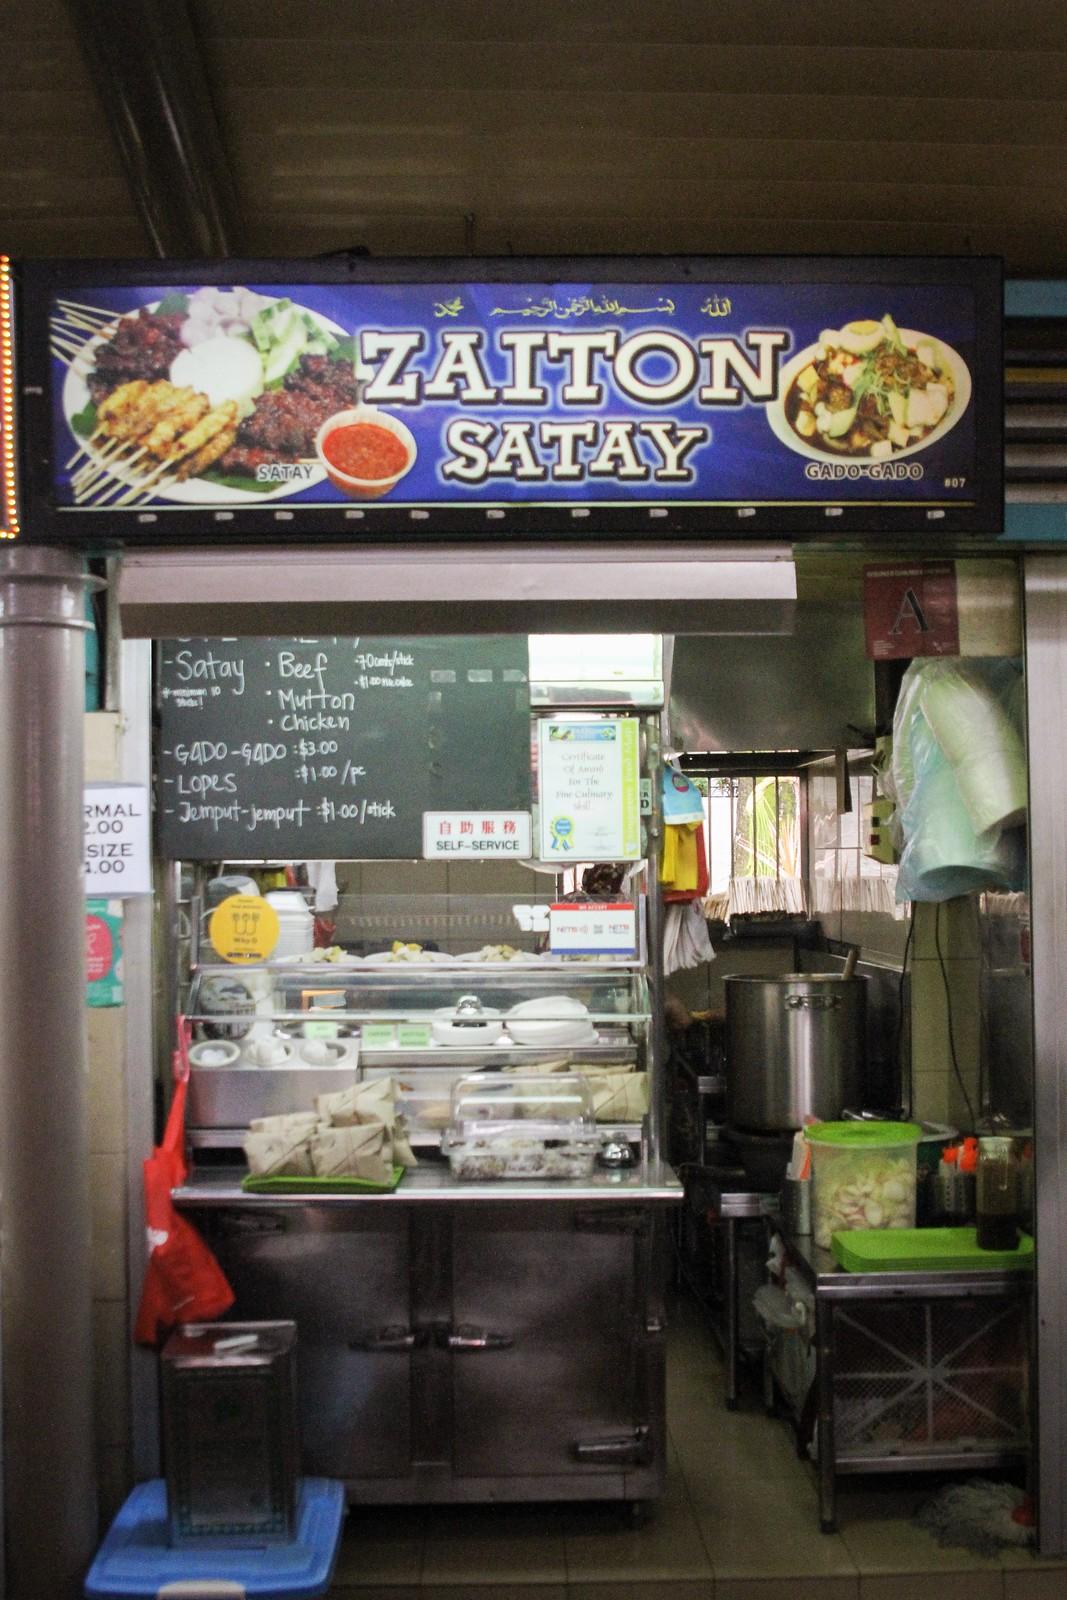 Adam Road Food Centre - Zaiton Satay